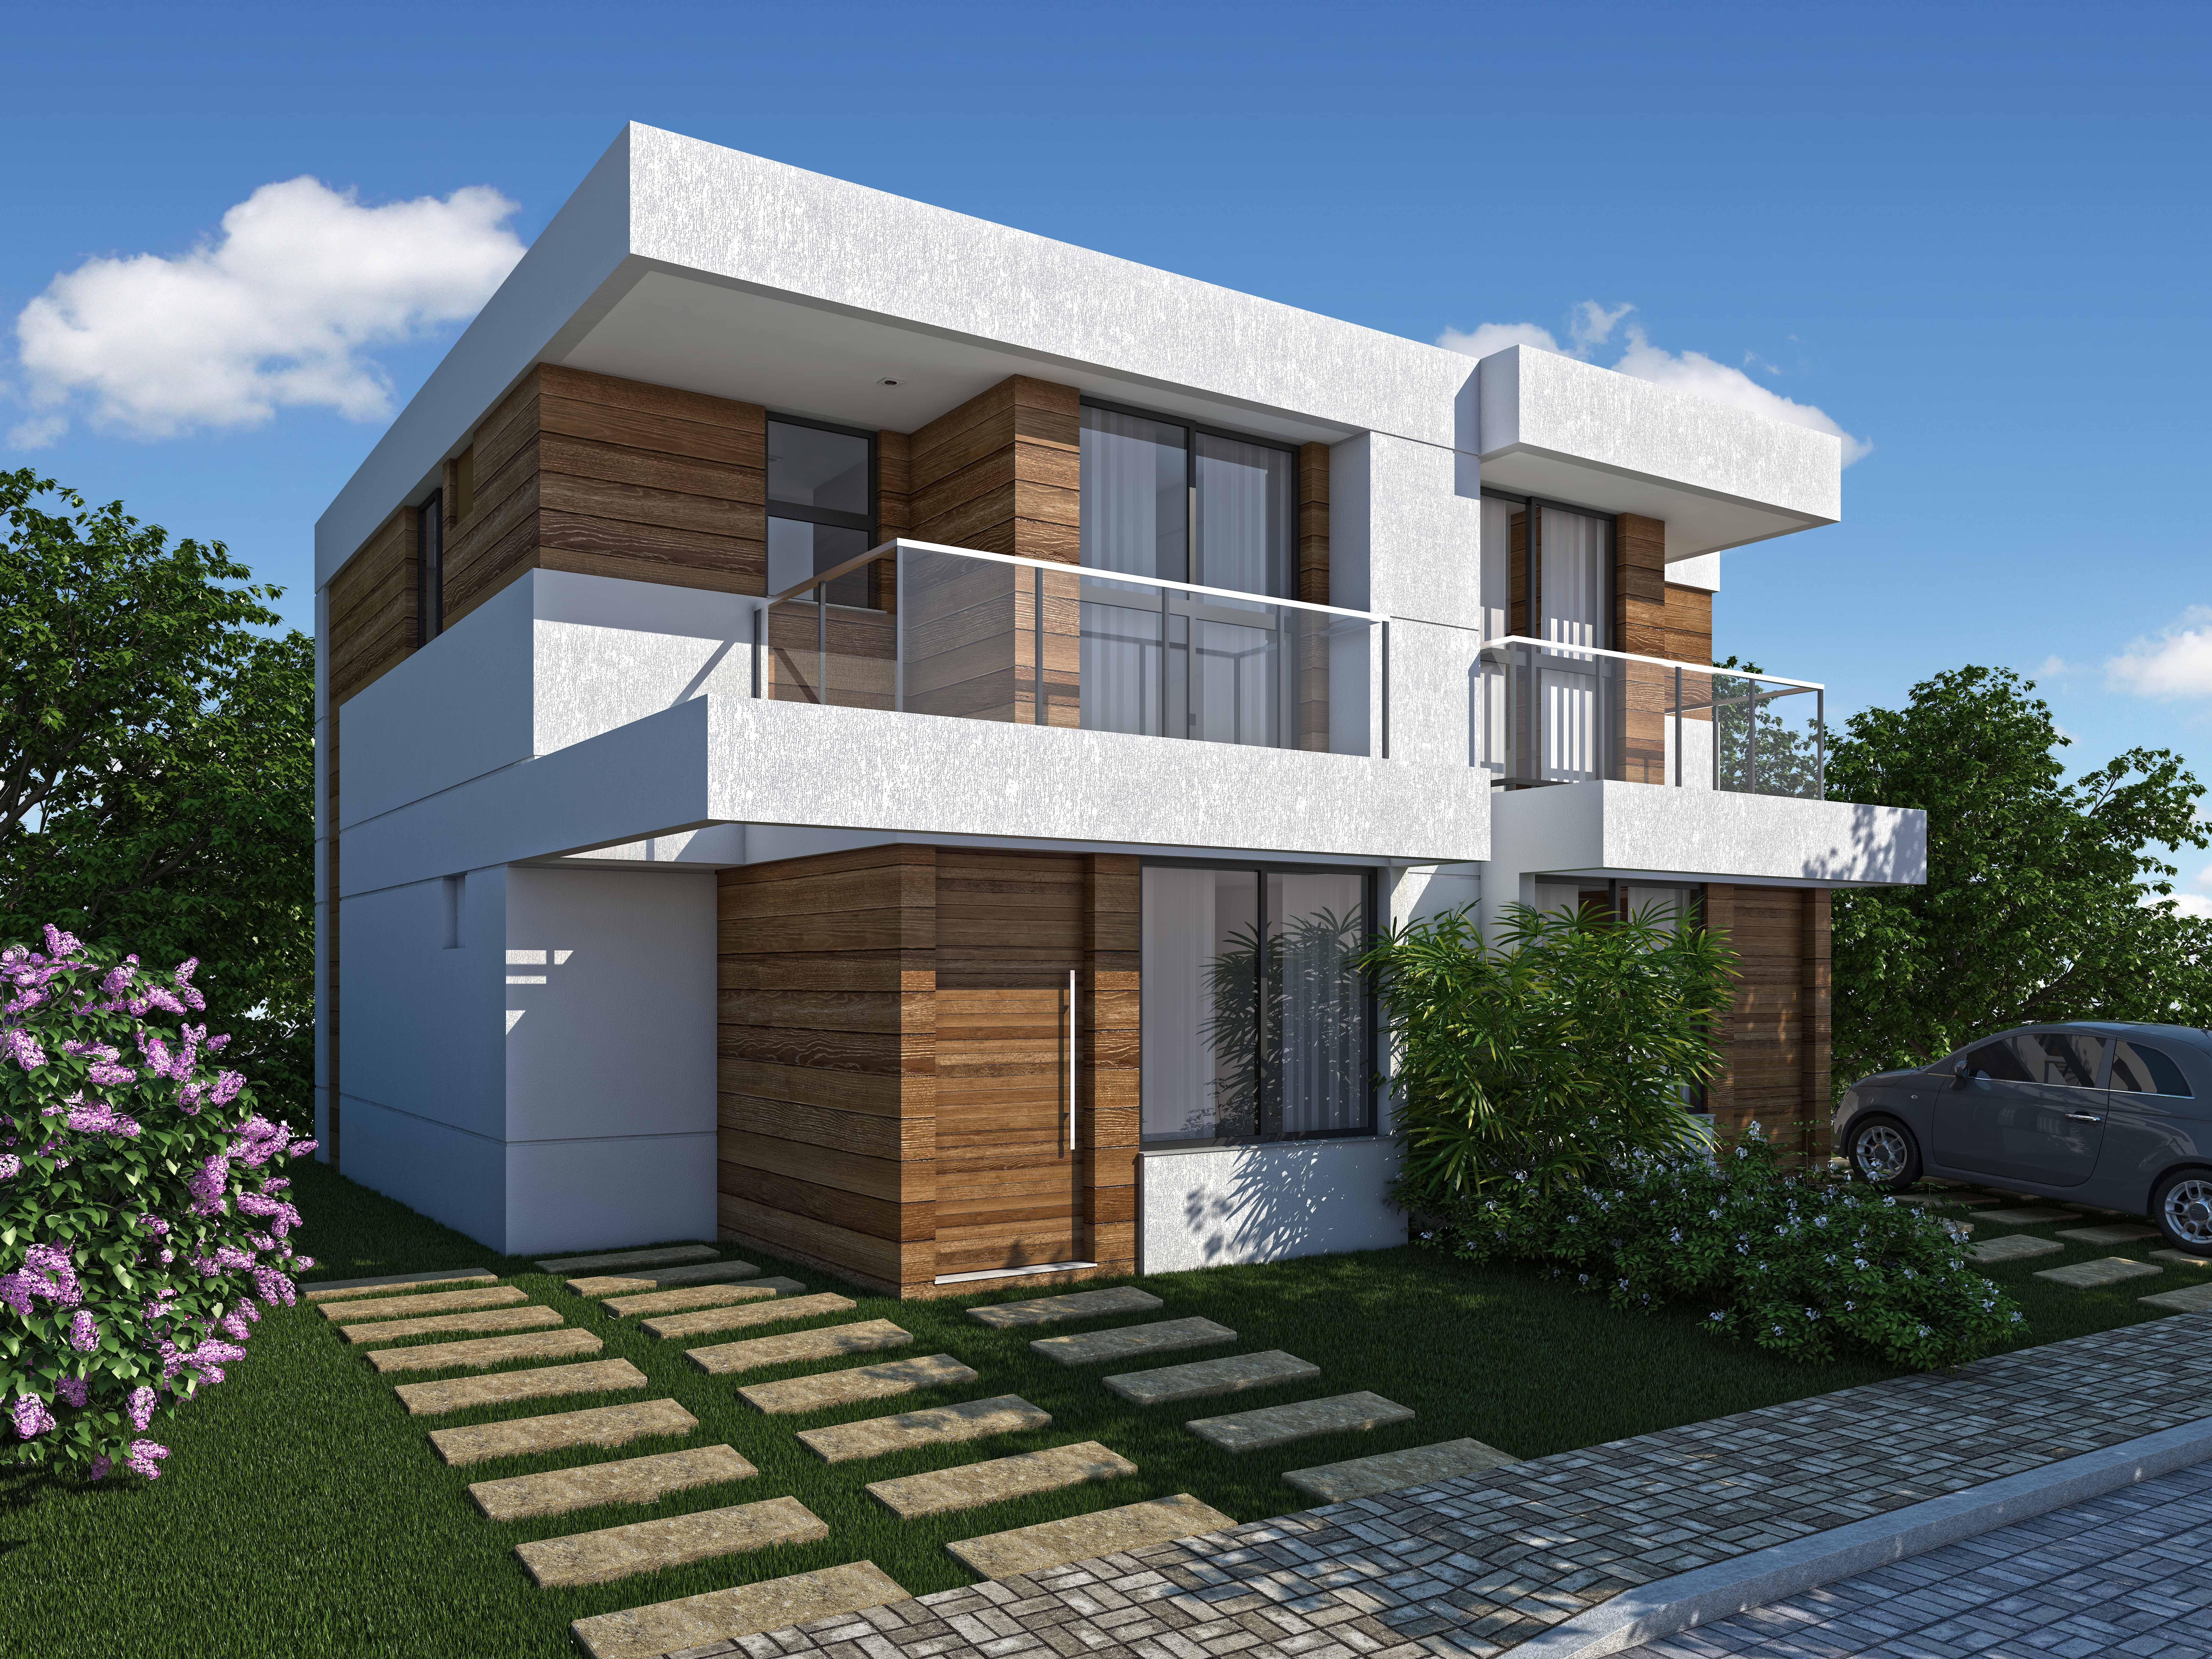 132 casas bonitas modernas fotos lindas